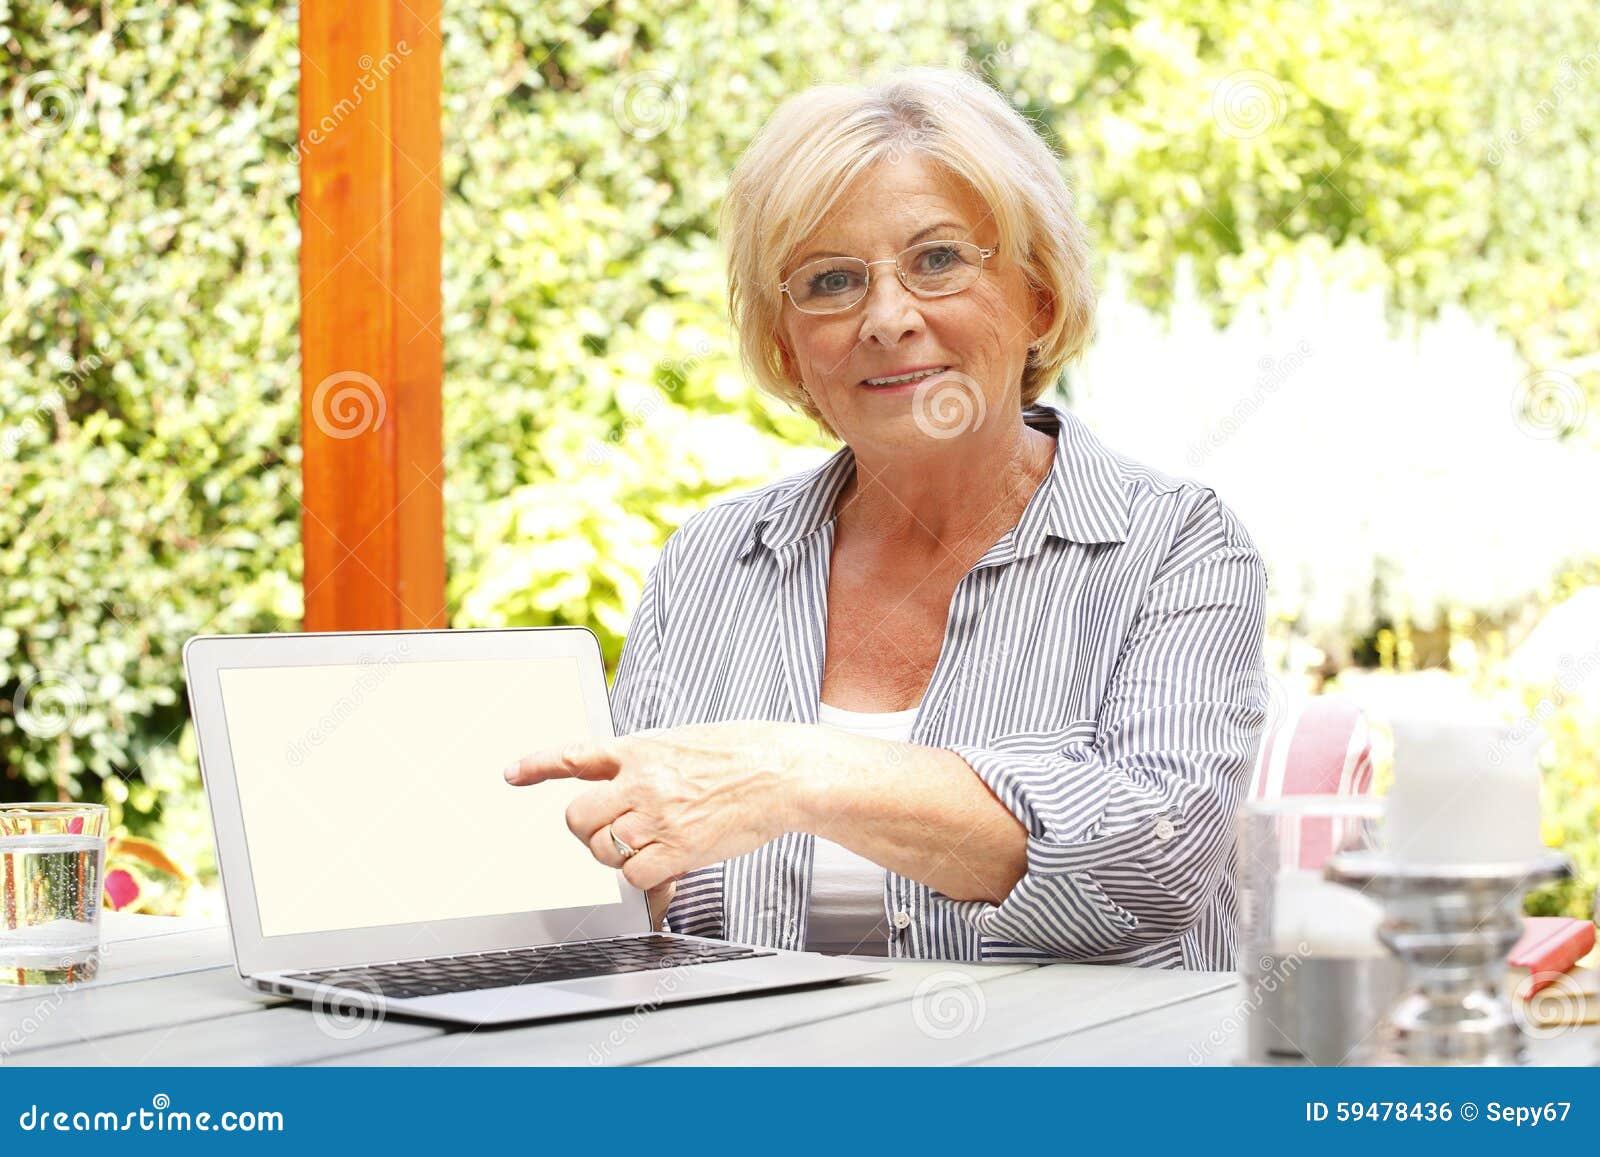 взять займ пенсионеру онлайн